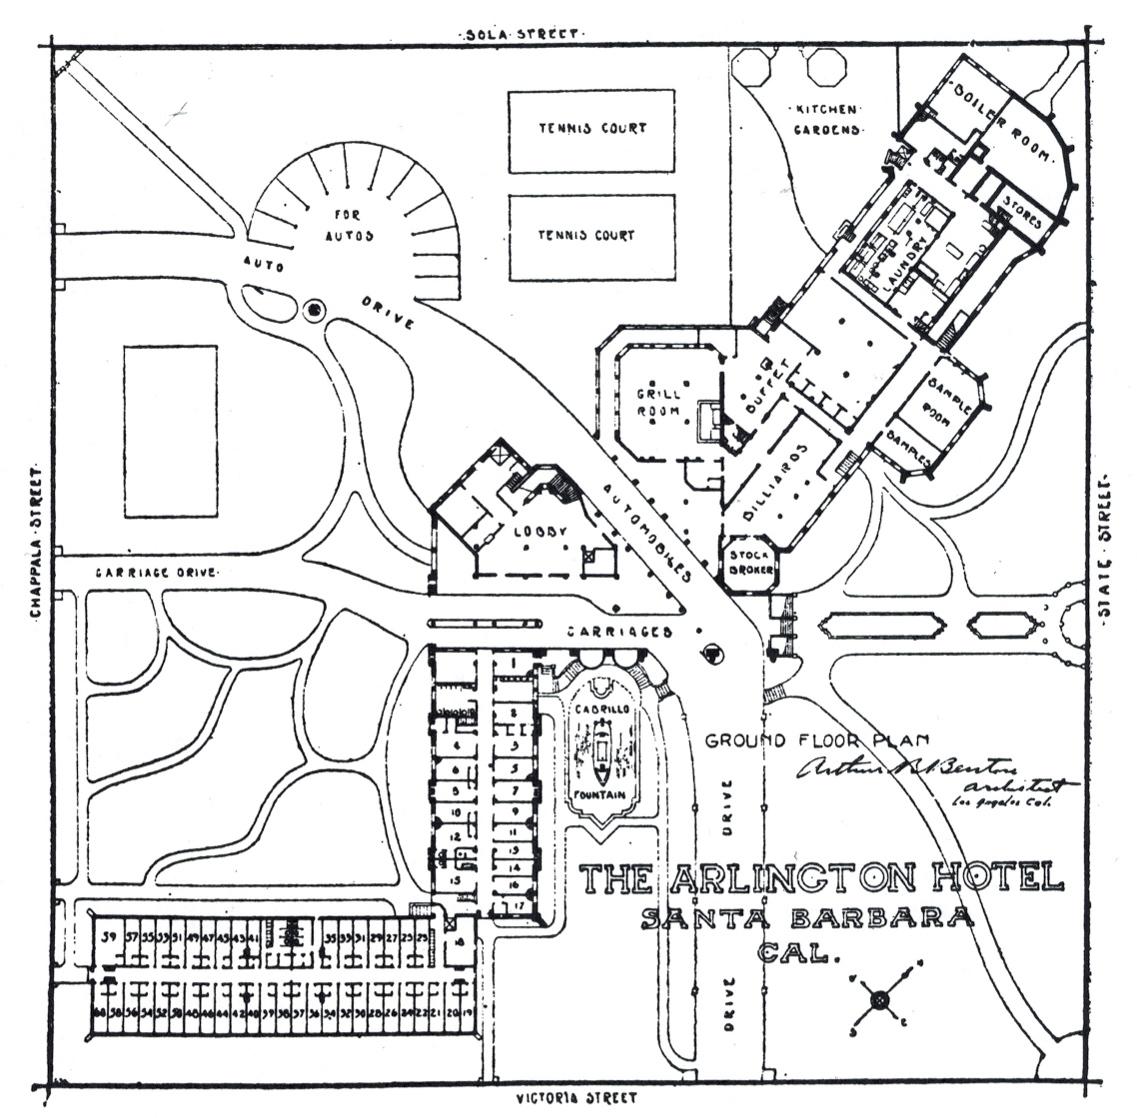 layout rebuilt arlington hotel santa barbara